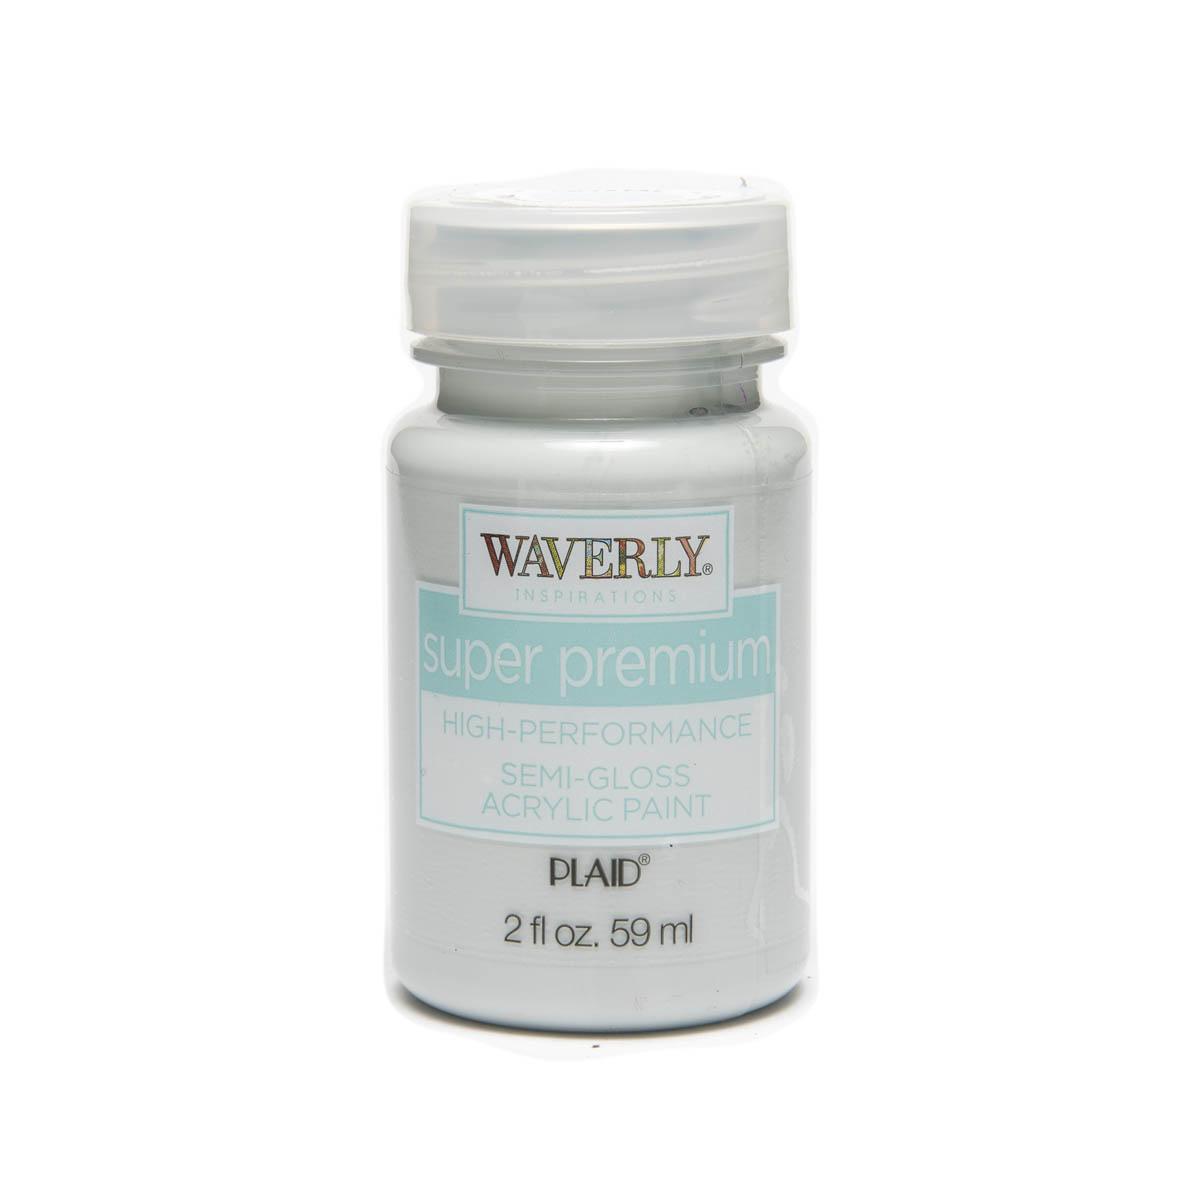 Waverly ® Inspirations Super Premium Semi-Gloss Acrylic Paint - Crystal, 2 oz.